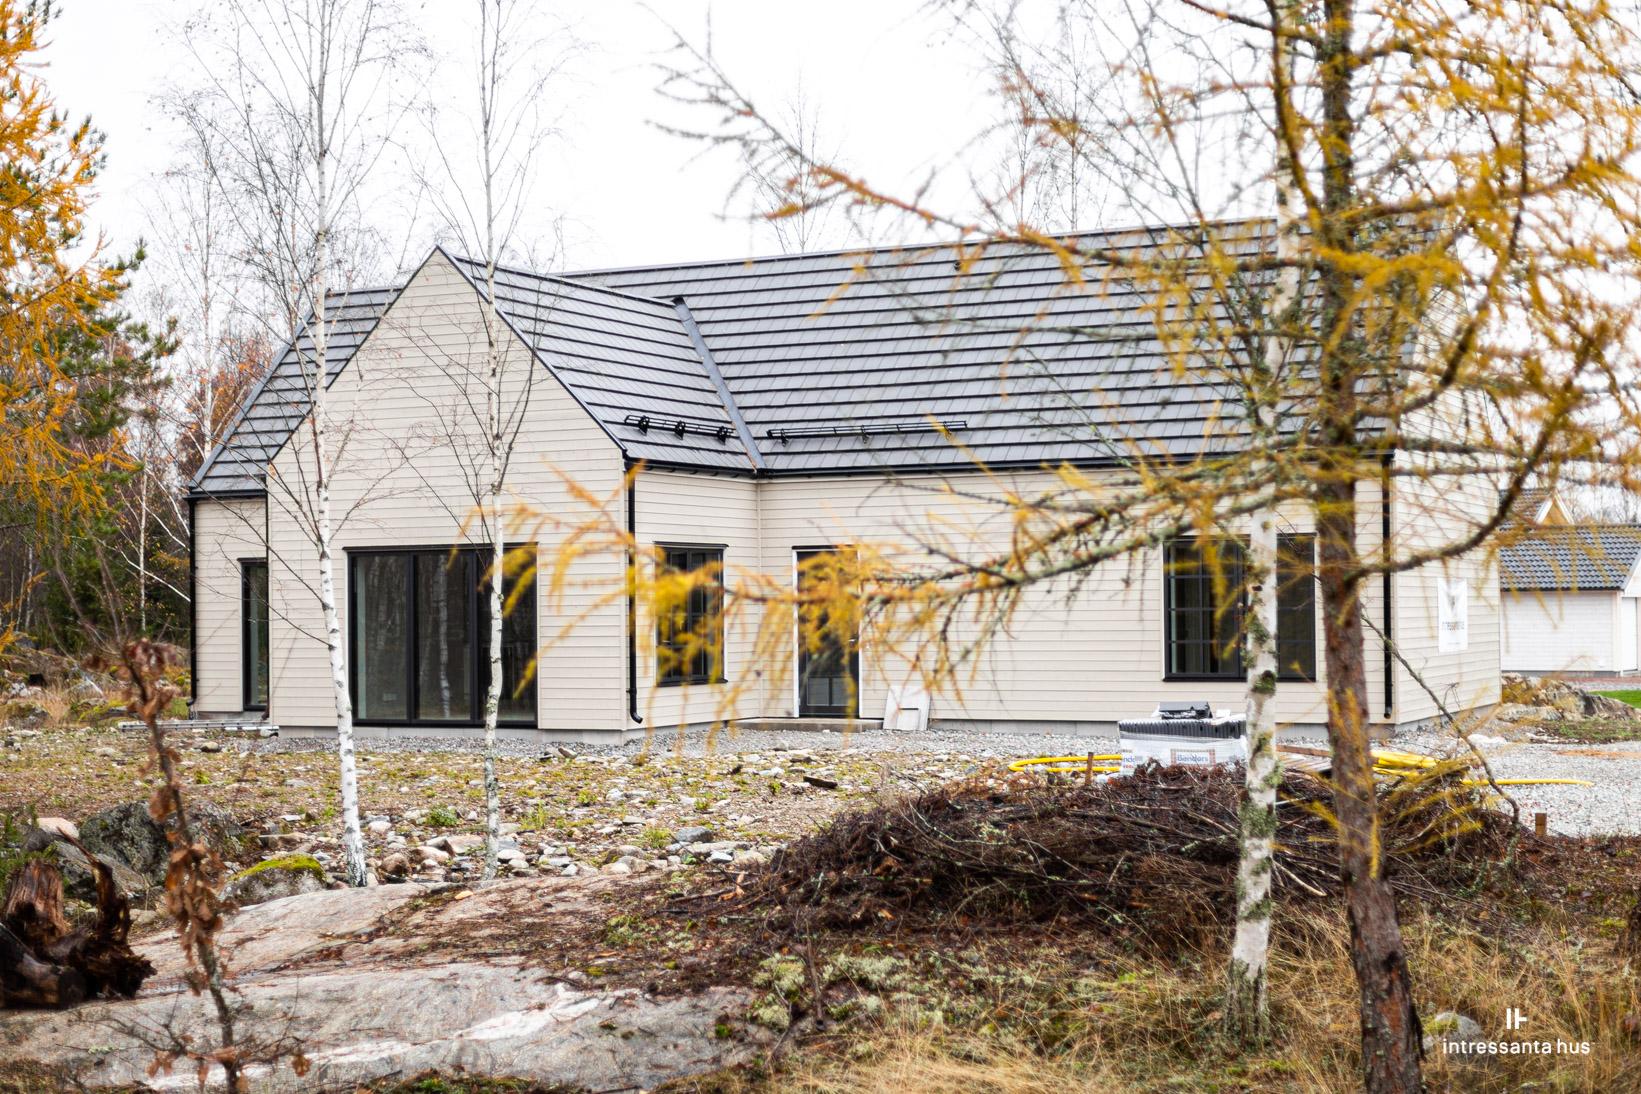 intressantahus-svedbergfredriksson-004